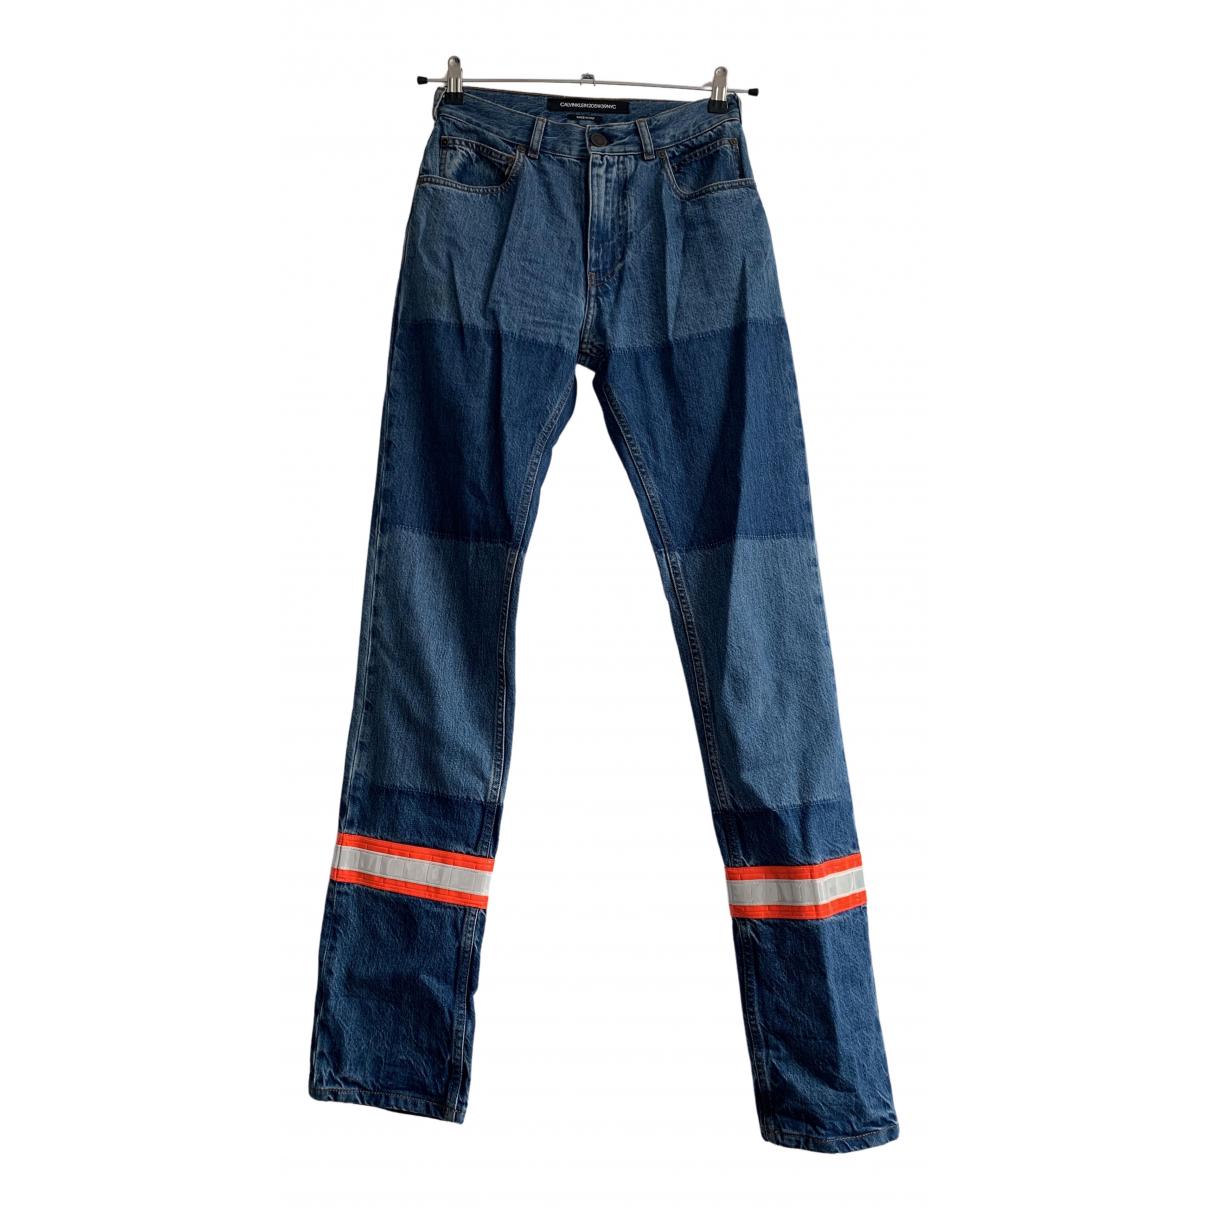 Calvin Klein 205w39nyc \N Jeans in  Blau Denim - Jeans